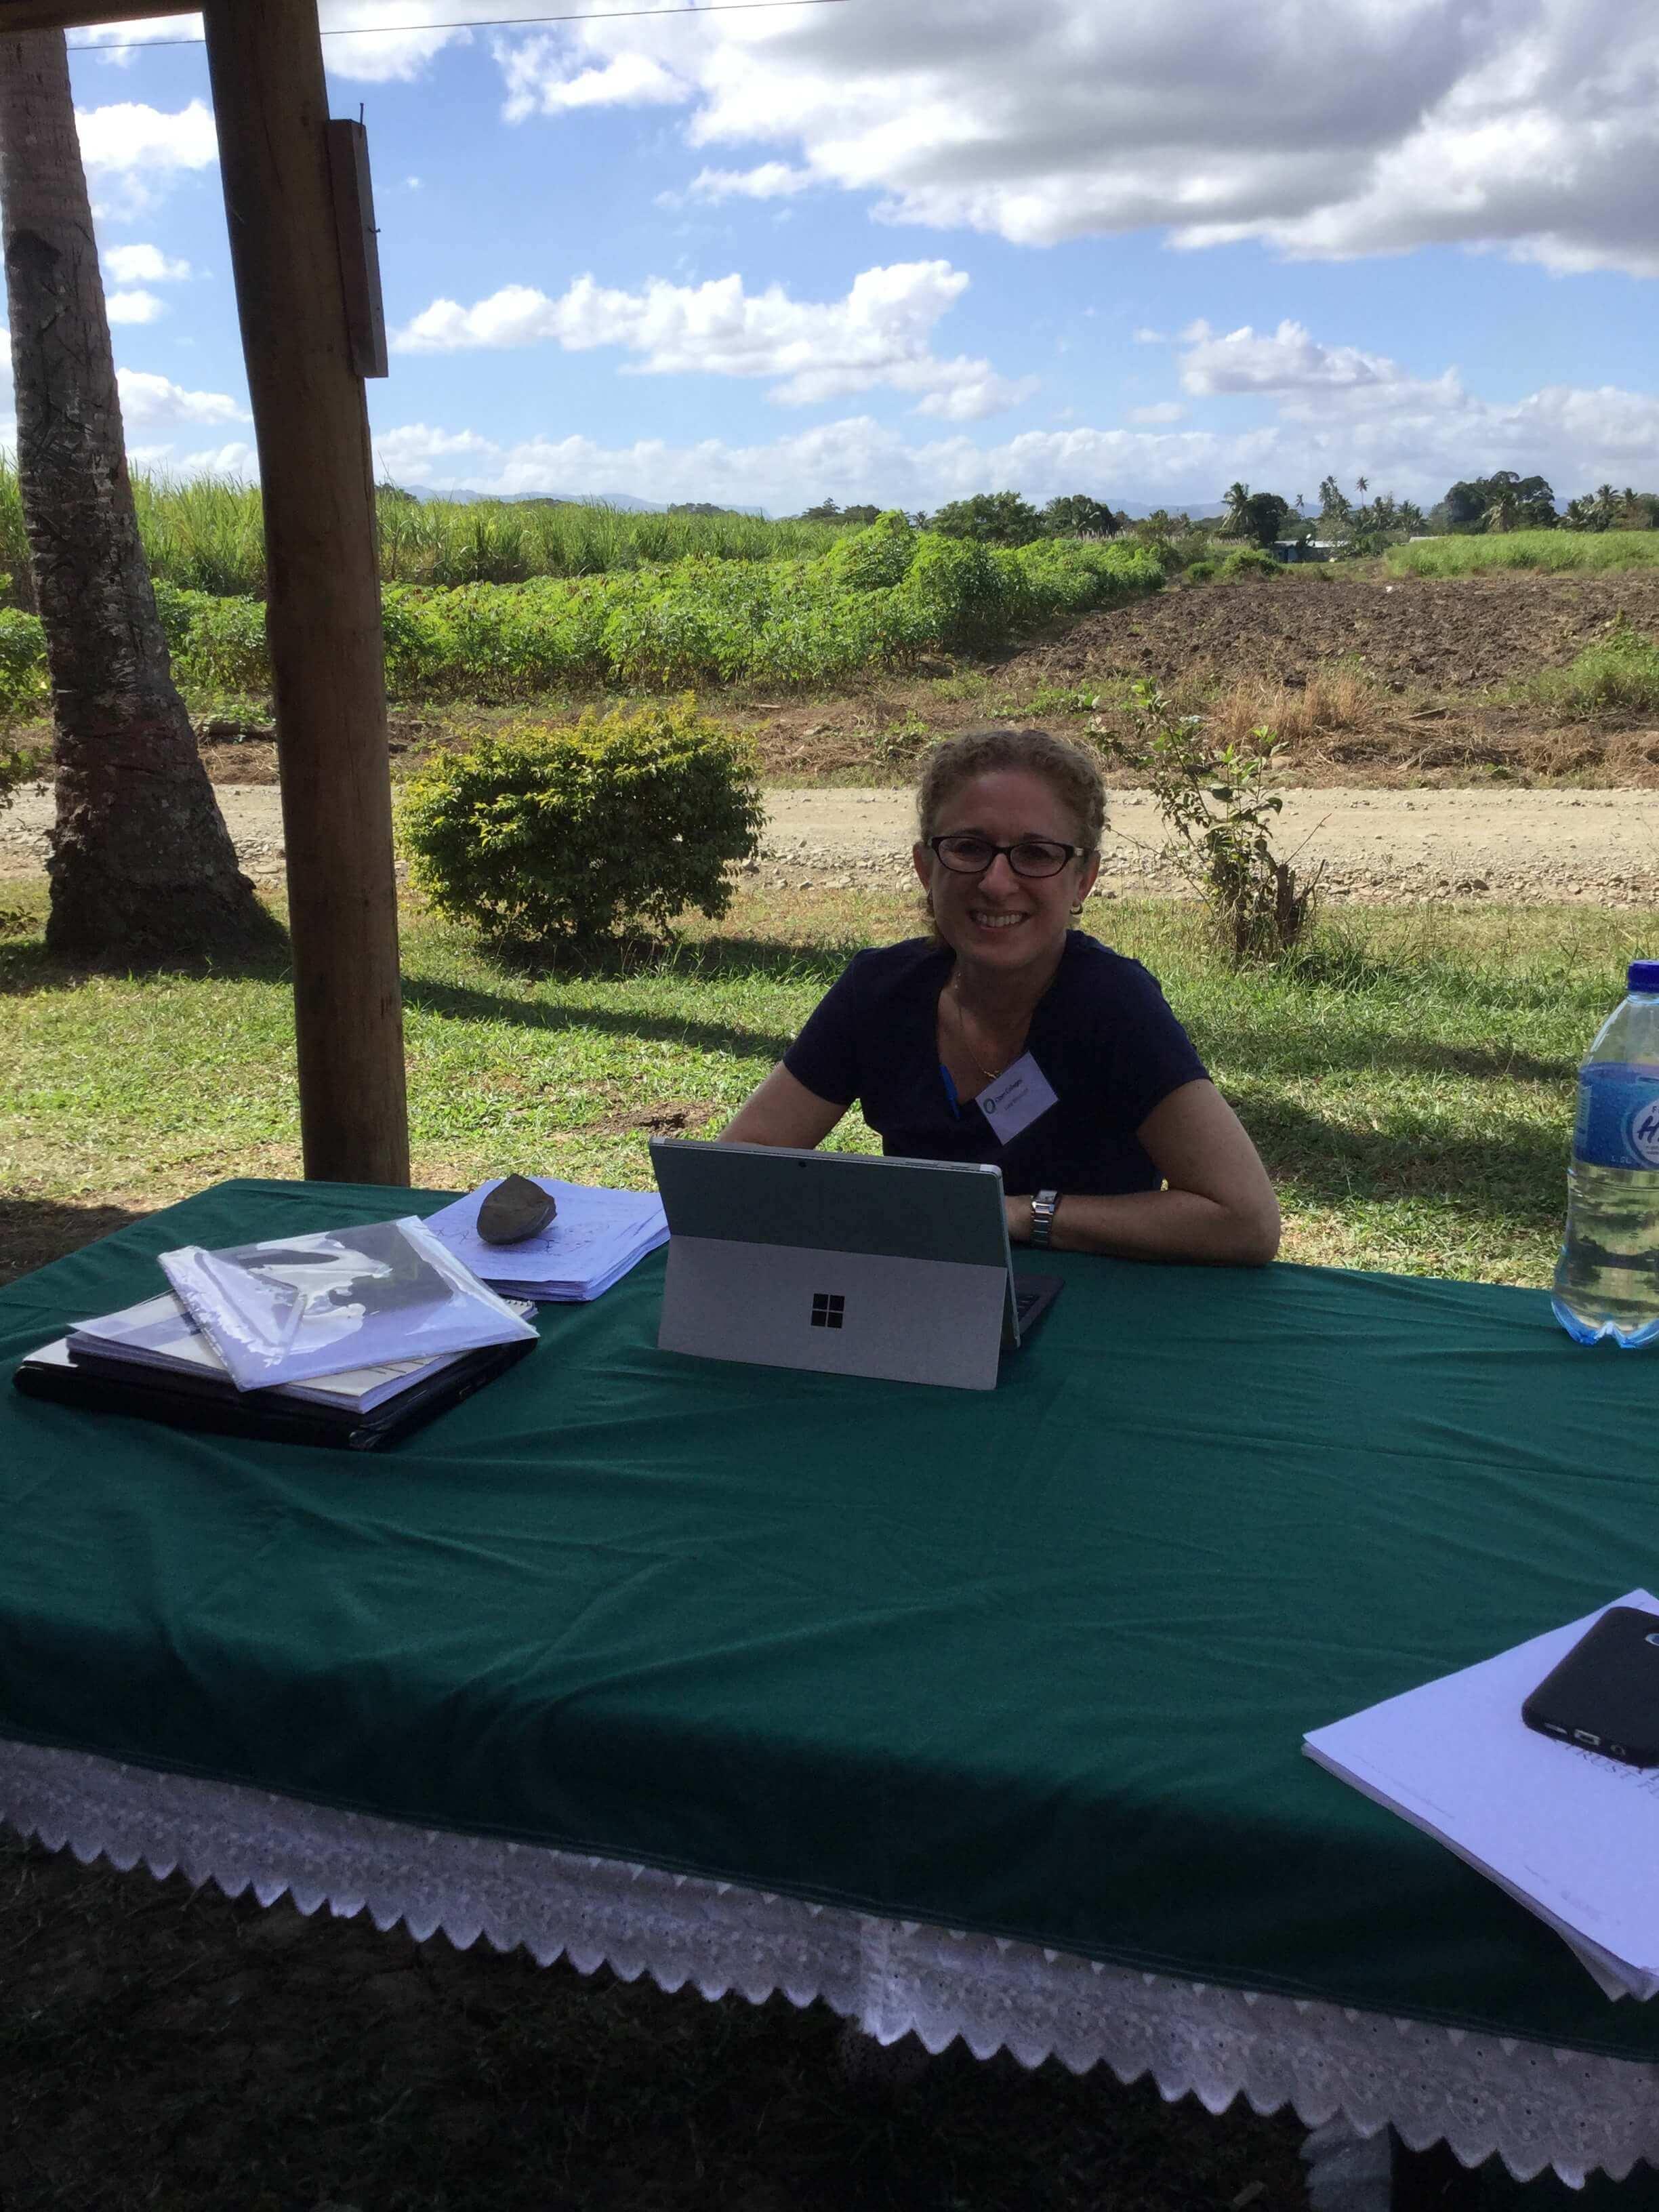 Lucy, studying, working, Fiji